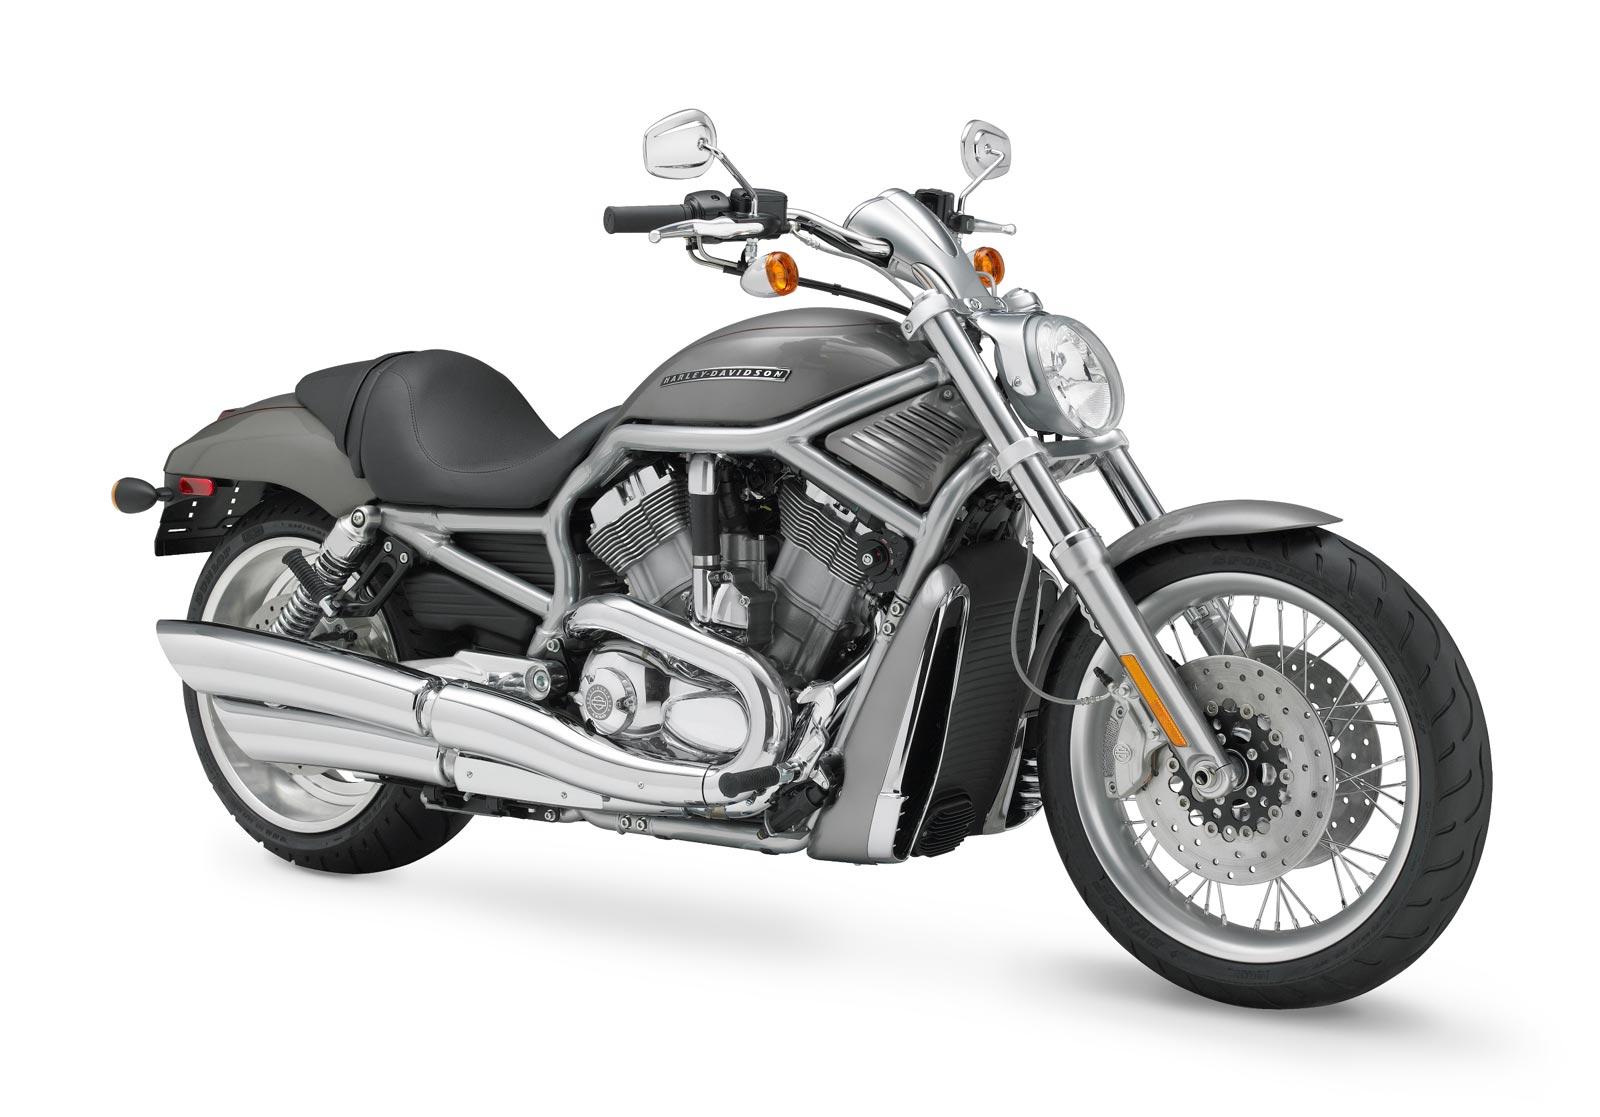 Compare a harley davidson v rod muscle vrscf 2009 a 2017 com outra - Compare A Harley Davidson V Rod Vrscaw 2007 A 2010 Com Outra Moto